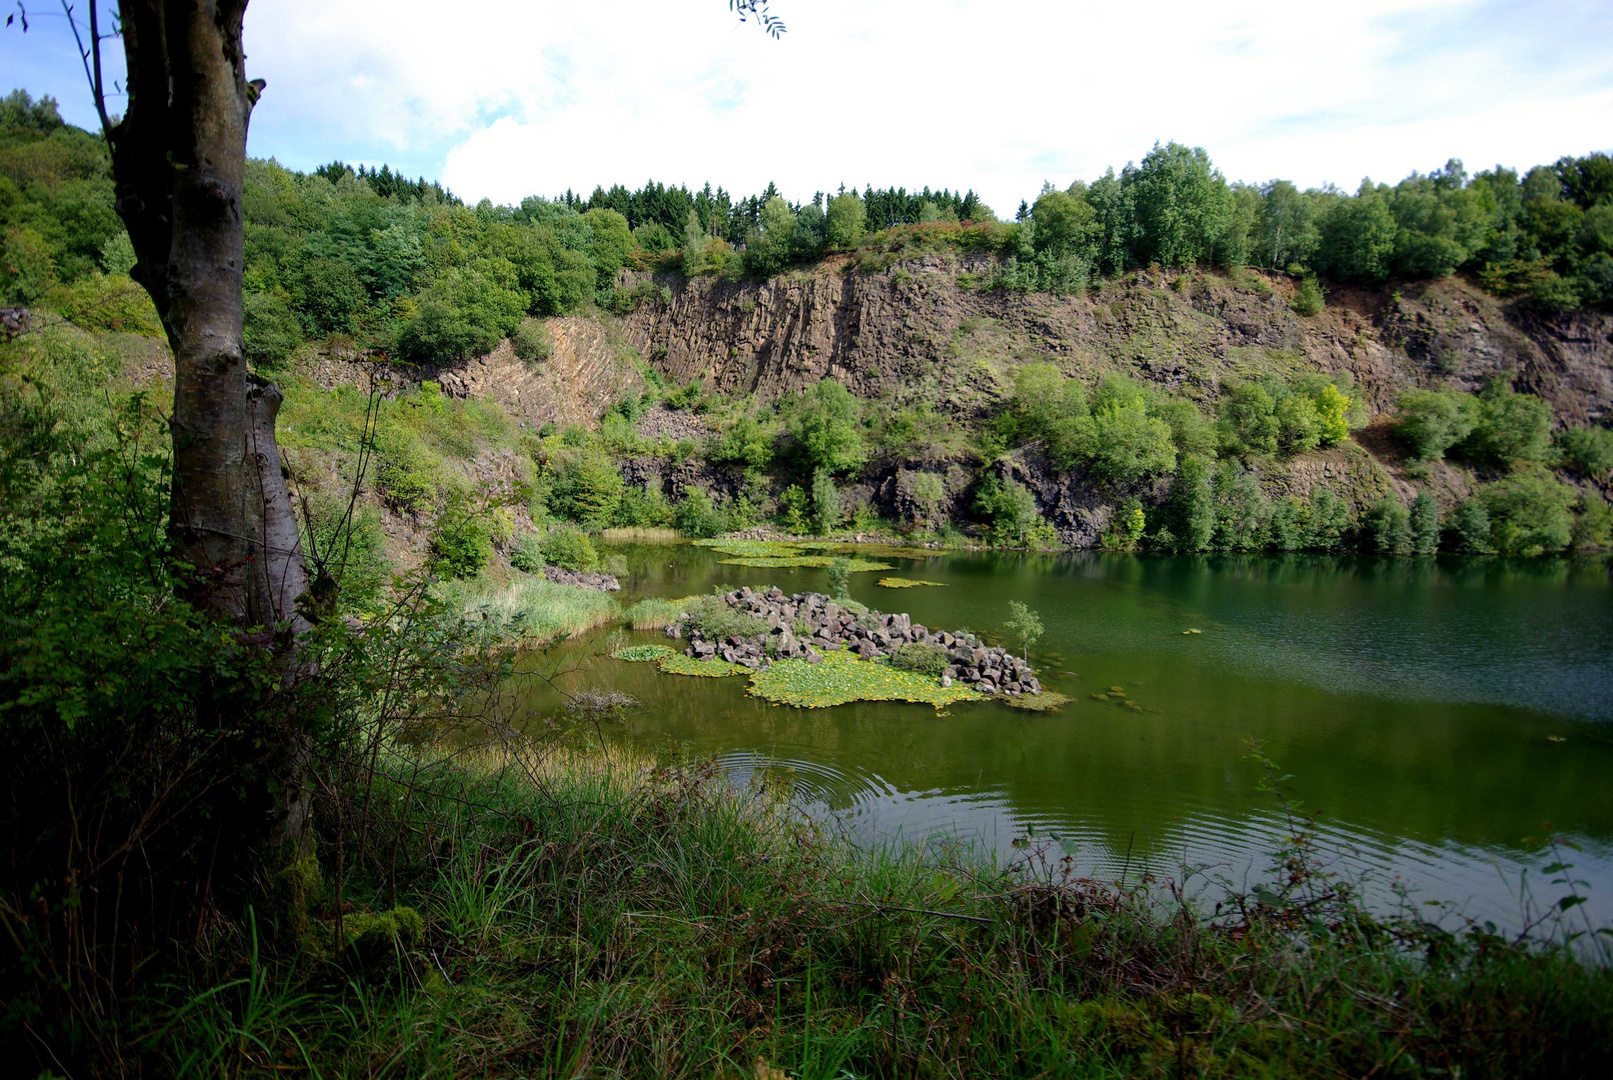 basaltpark bad marienberg westerwald foto bild landschaft ku nat natur bilder auf. Black Bedroom Furniture Sets. Home Design Ideas